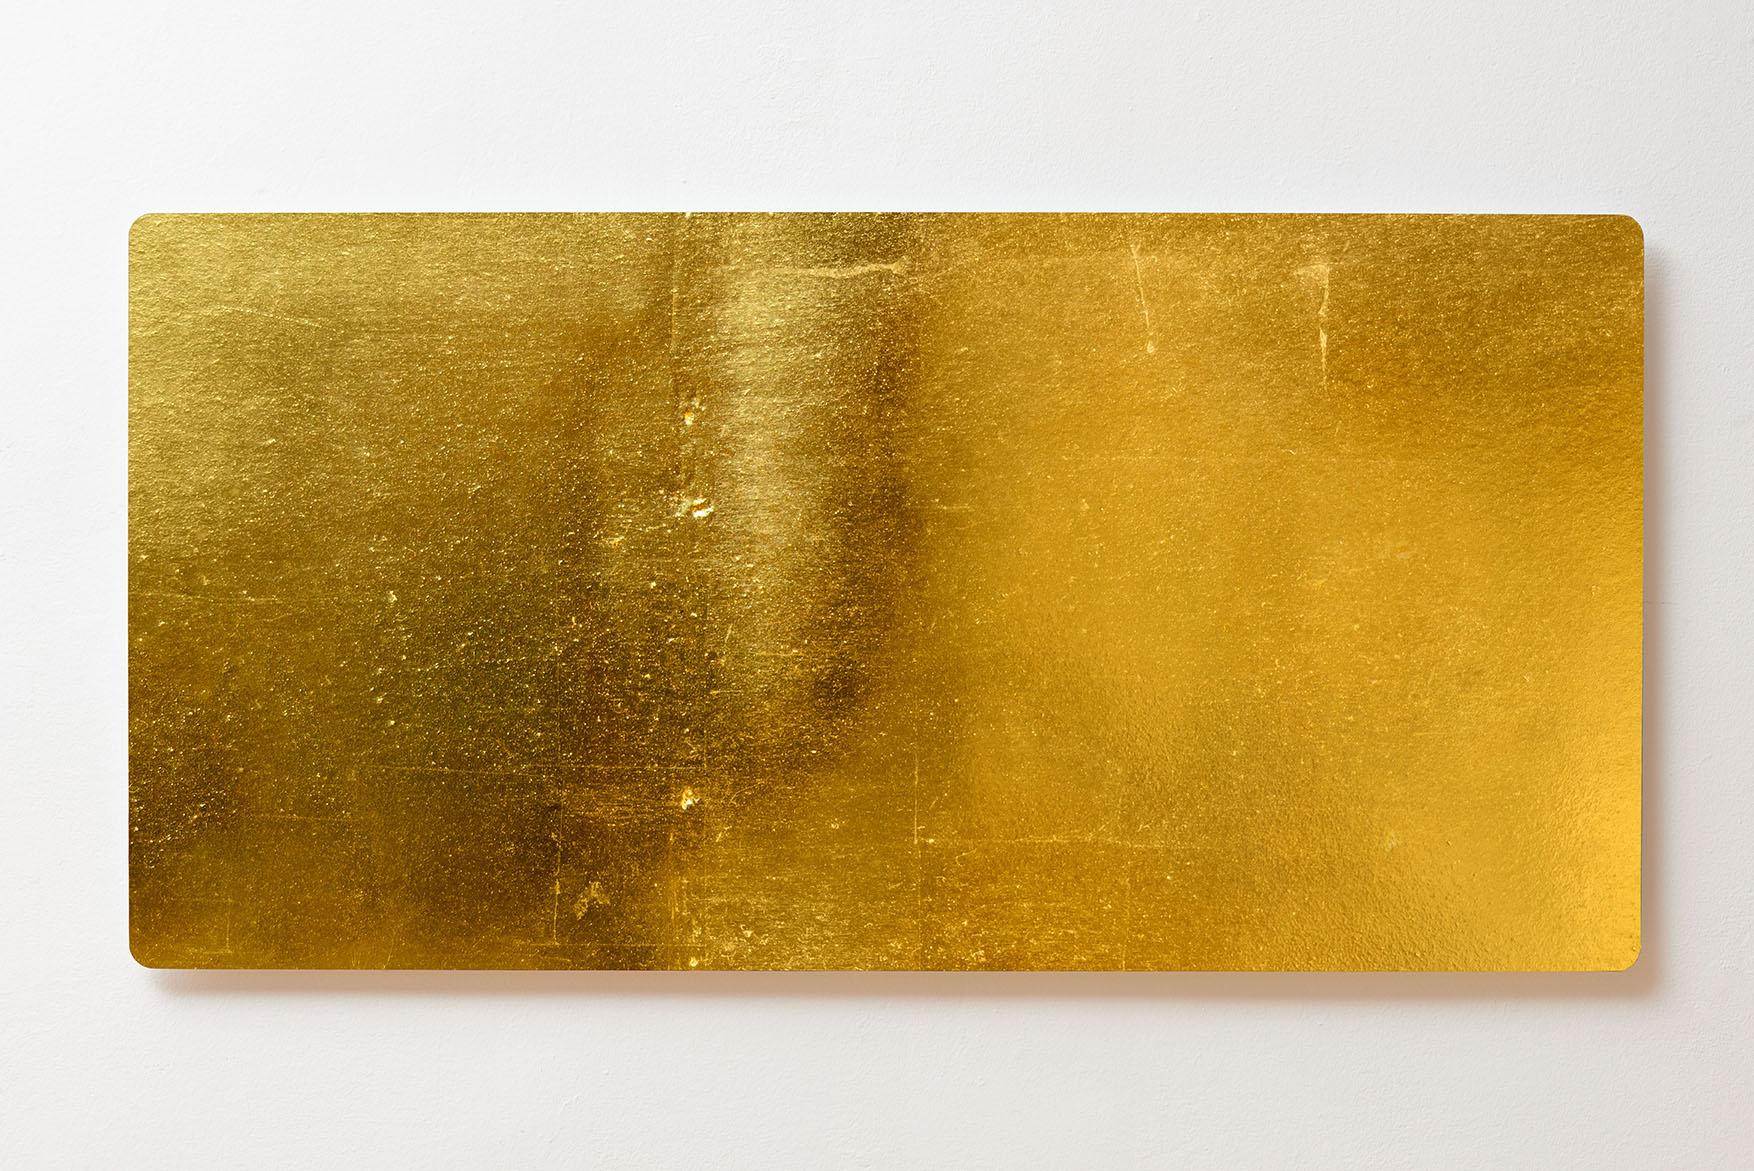 Magnettafel BACKLIGHT 120x60cm Motiv-Wandbild M151 Gold